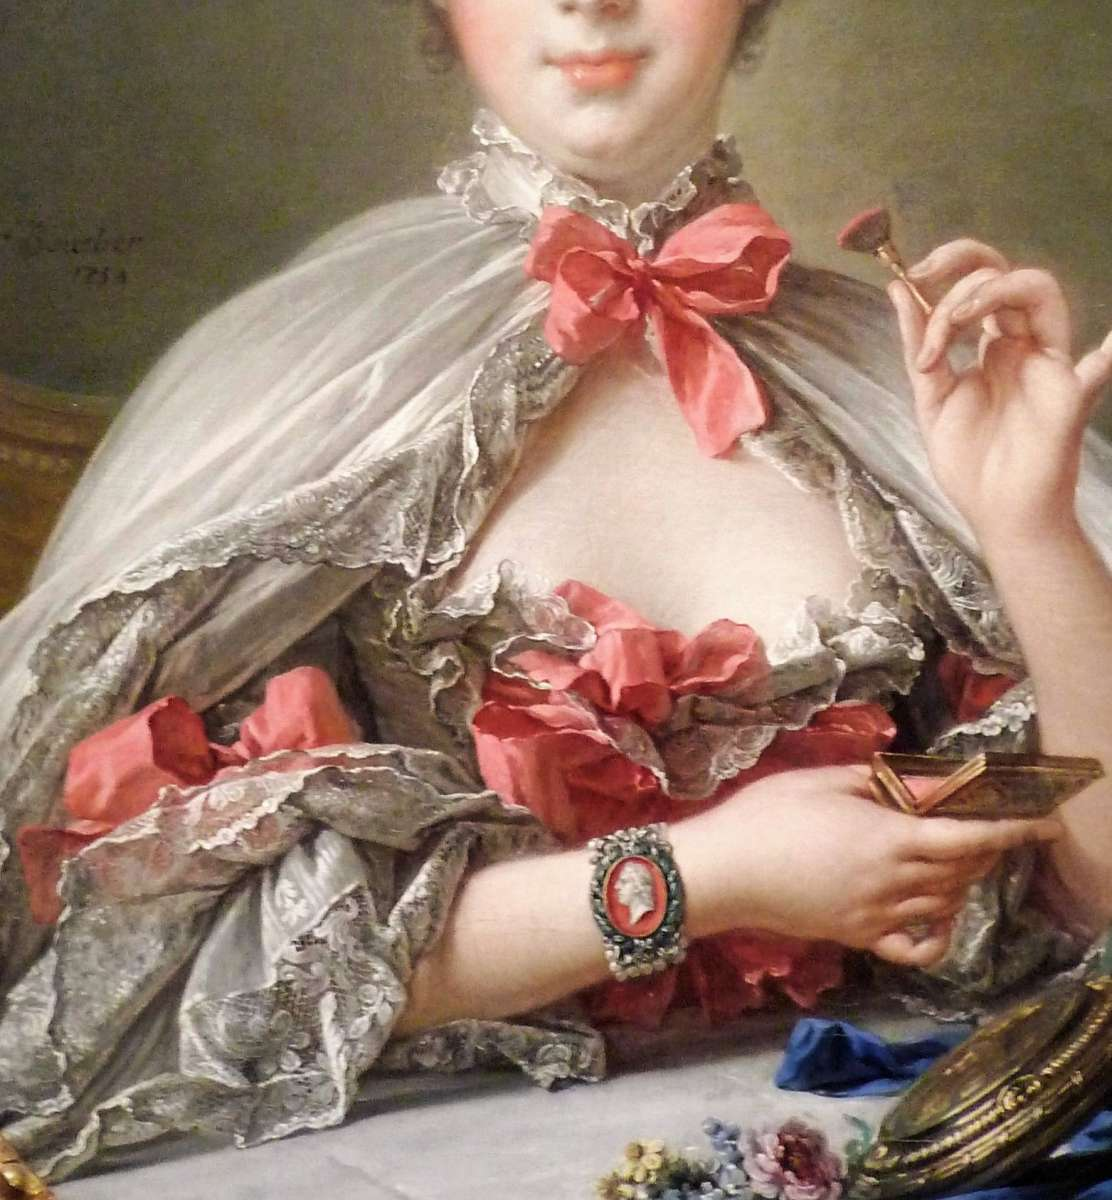 madame pompadour wearing bows